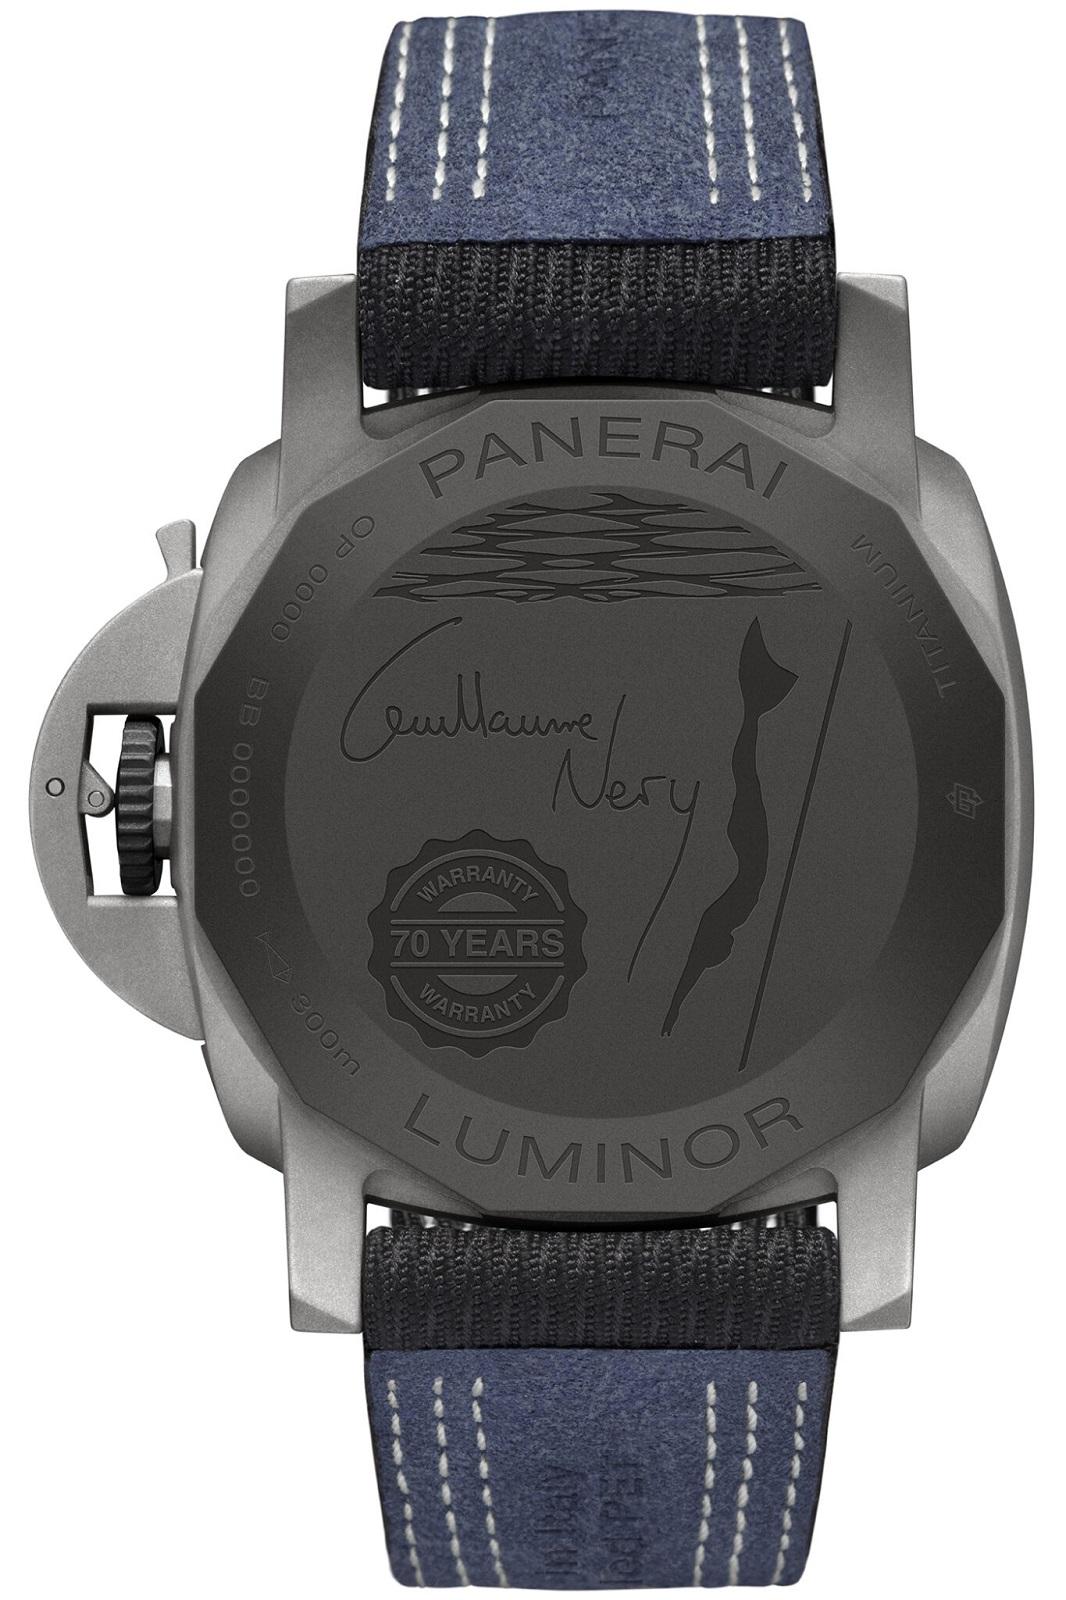 Panerai Luminor Marina 44mm Guillaume Néry Edition